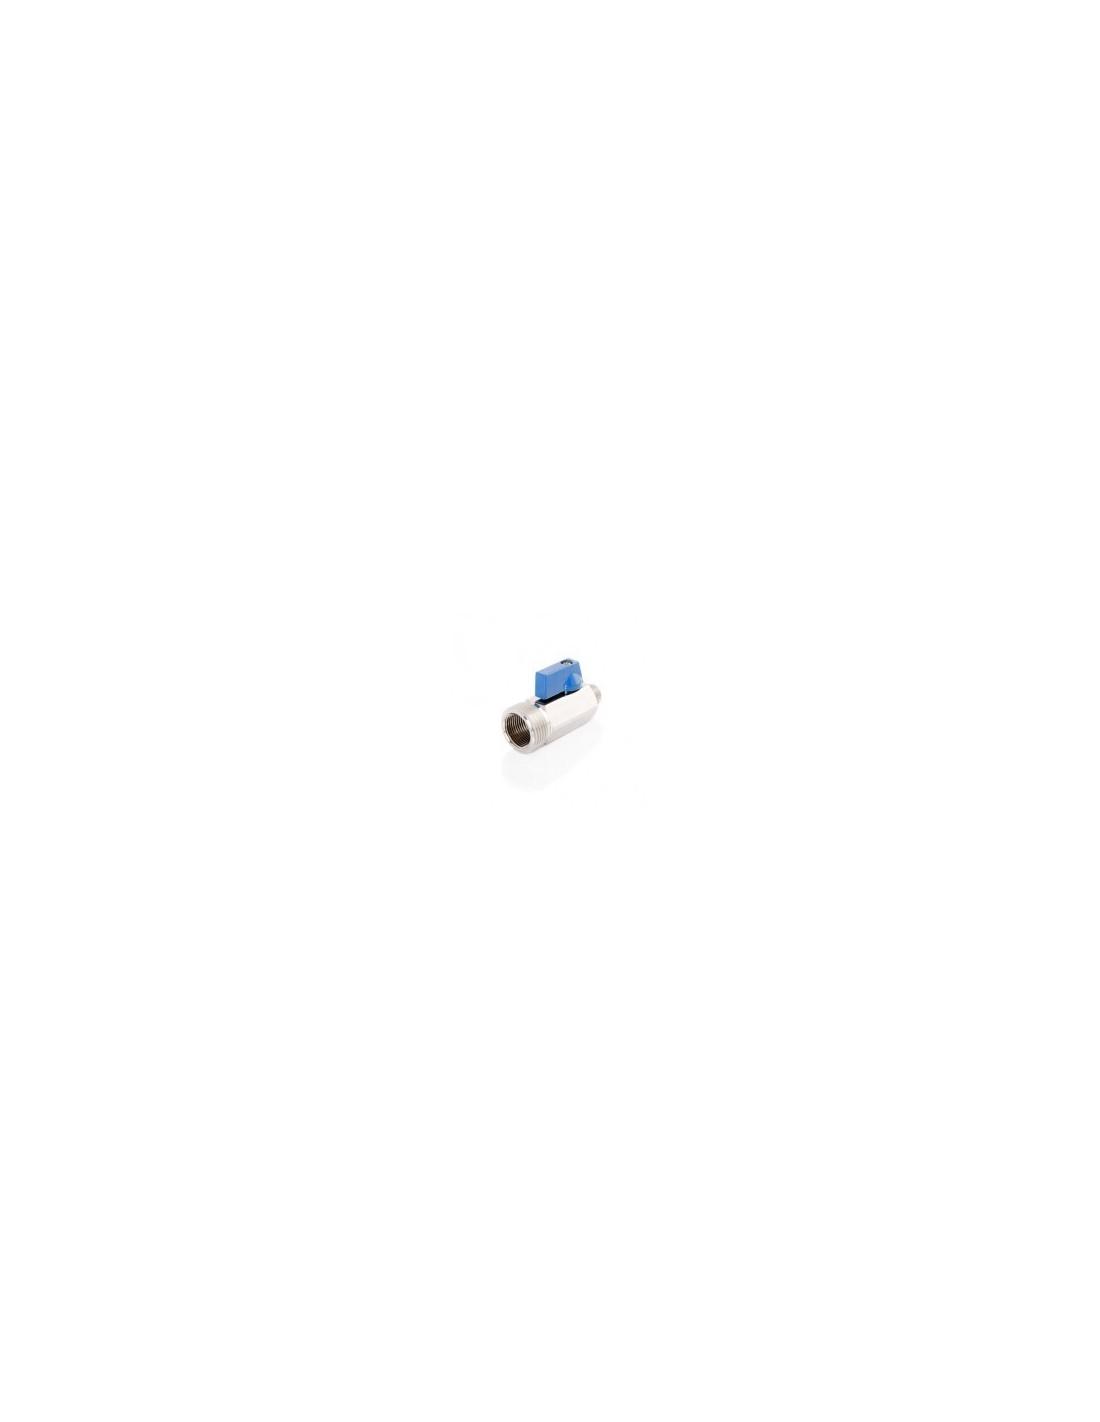 RED01862 - Regulatorer & Tryckreducering - Reduceringsventil